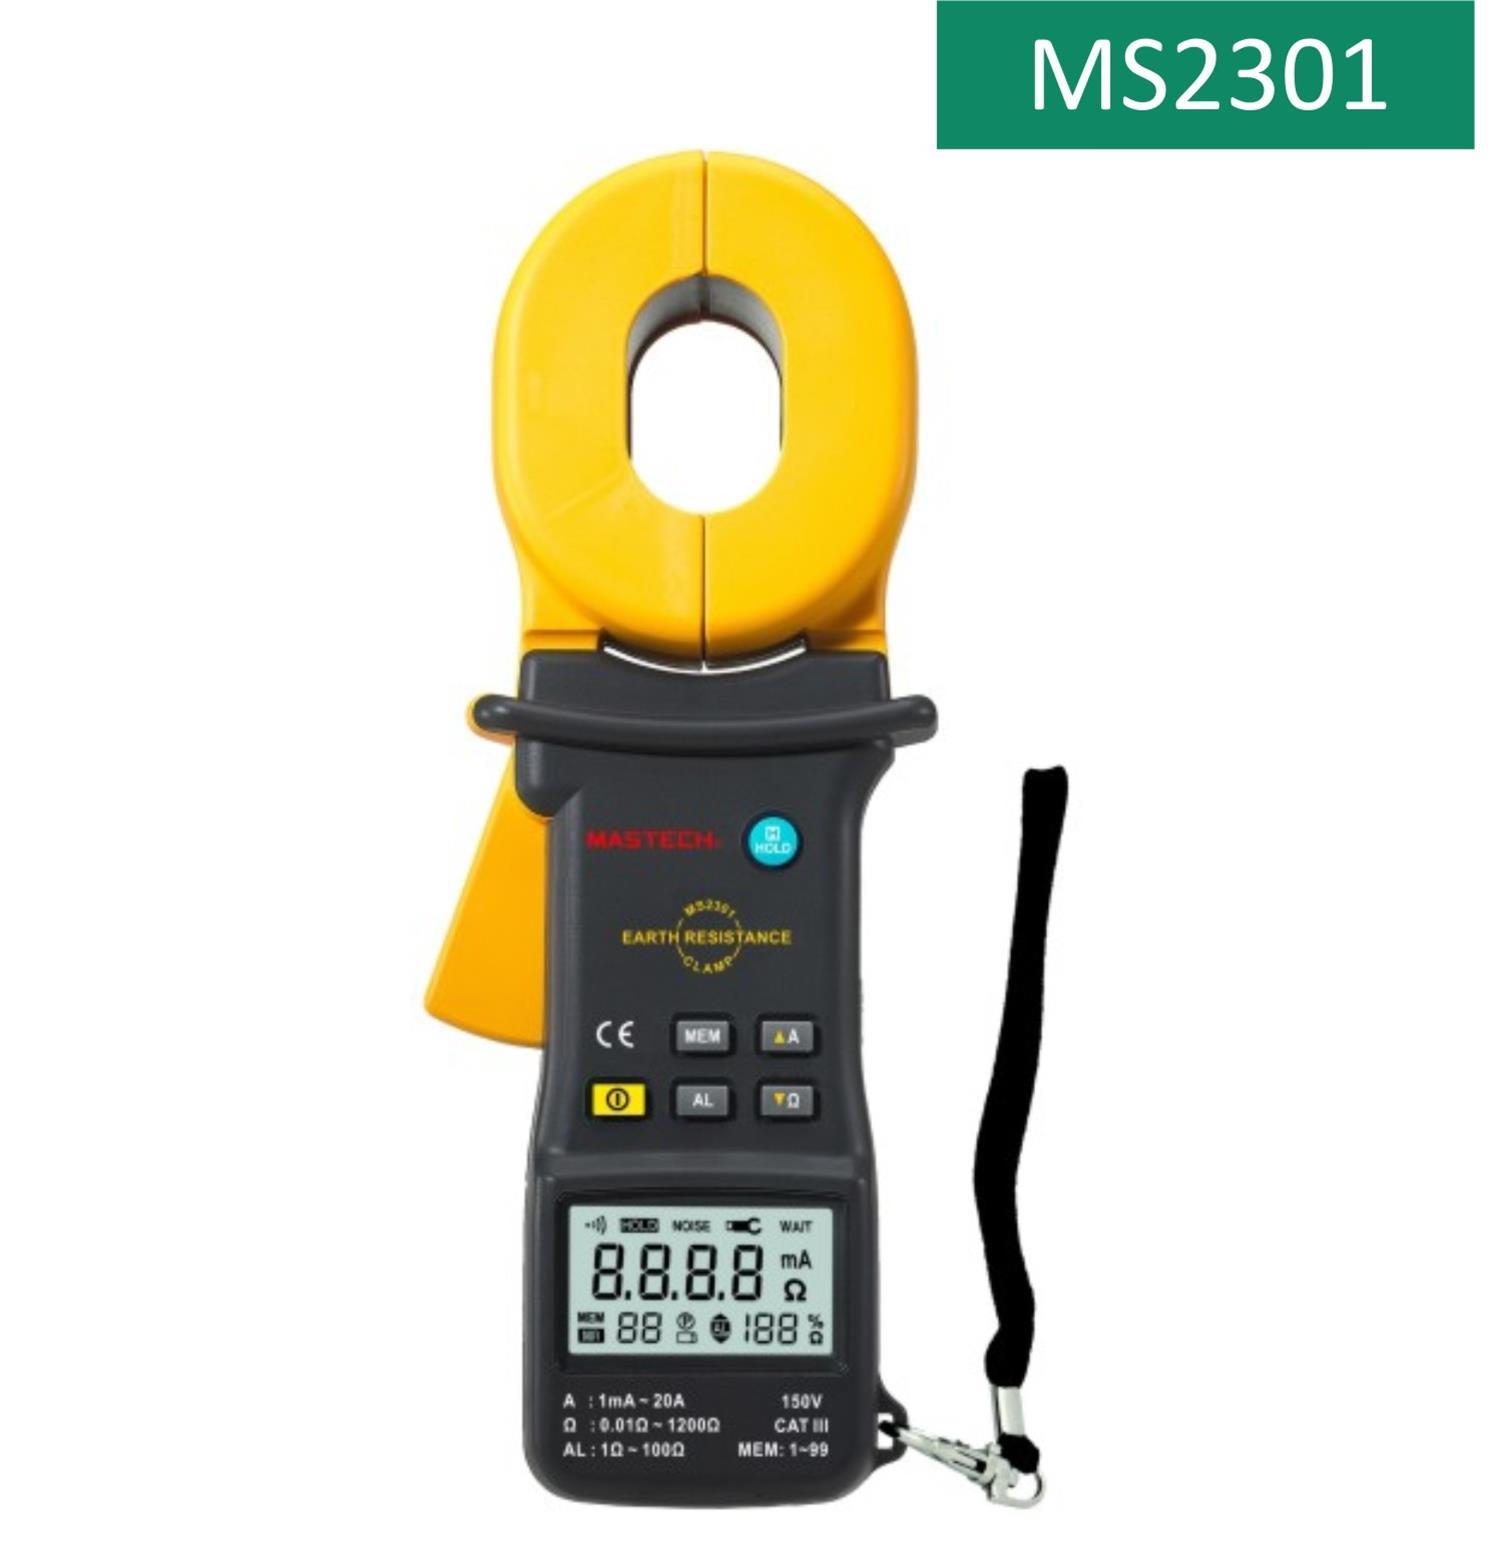 MS2301